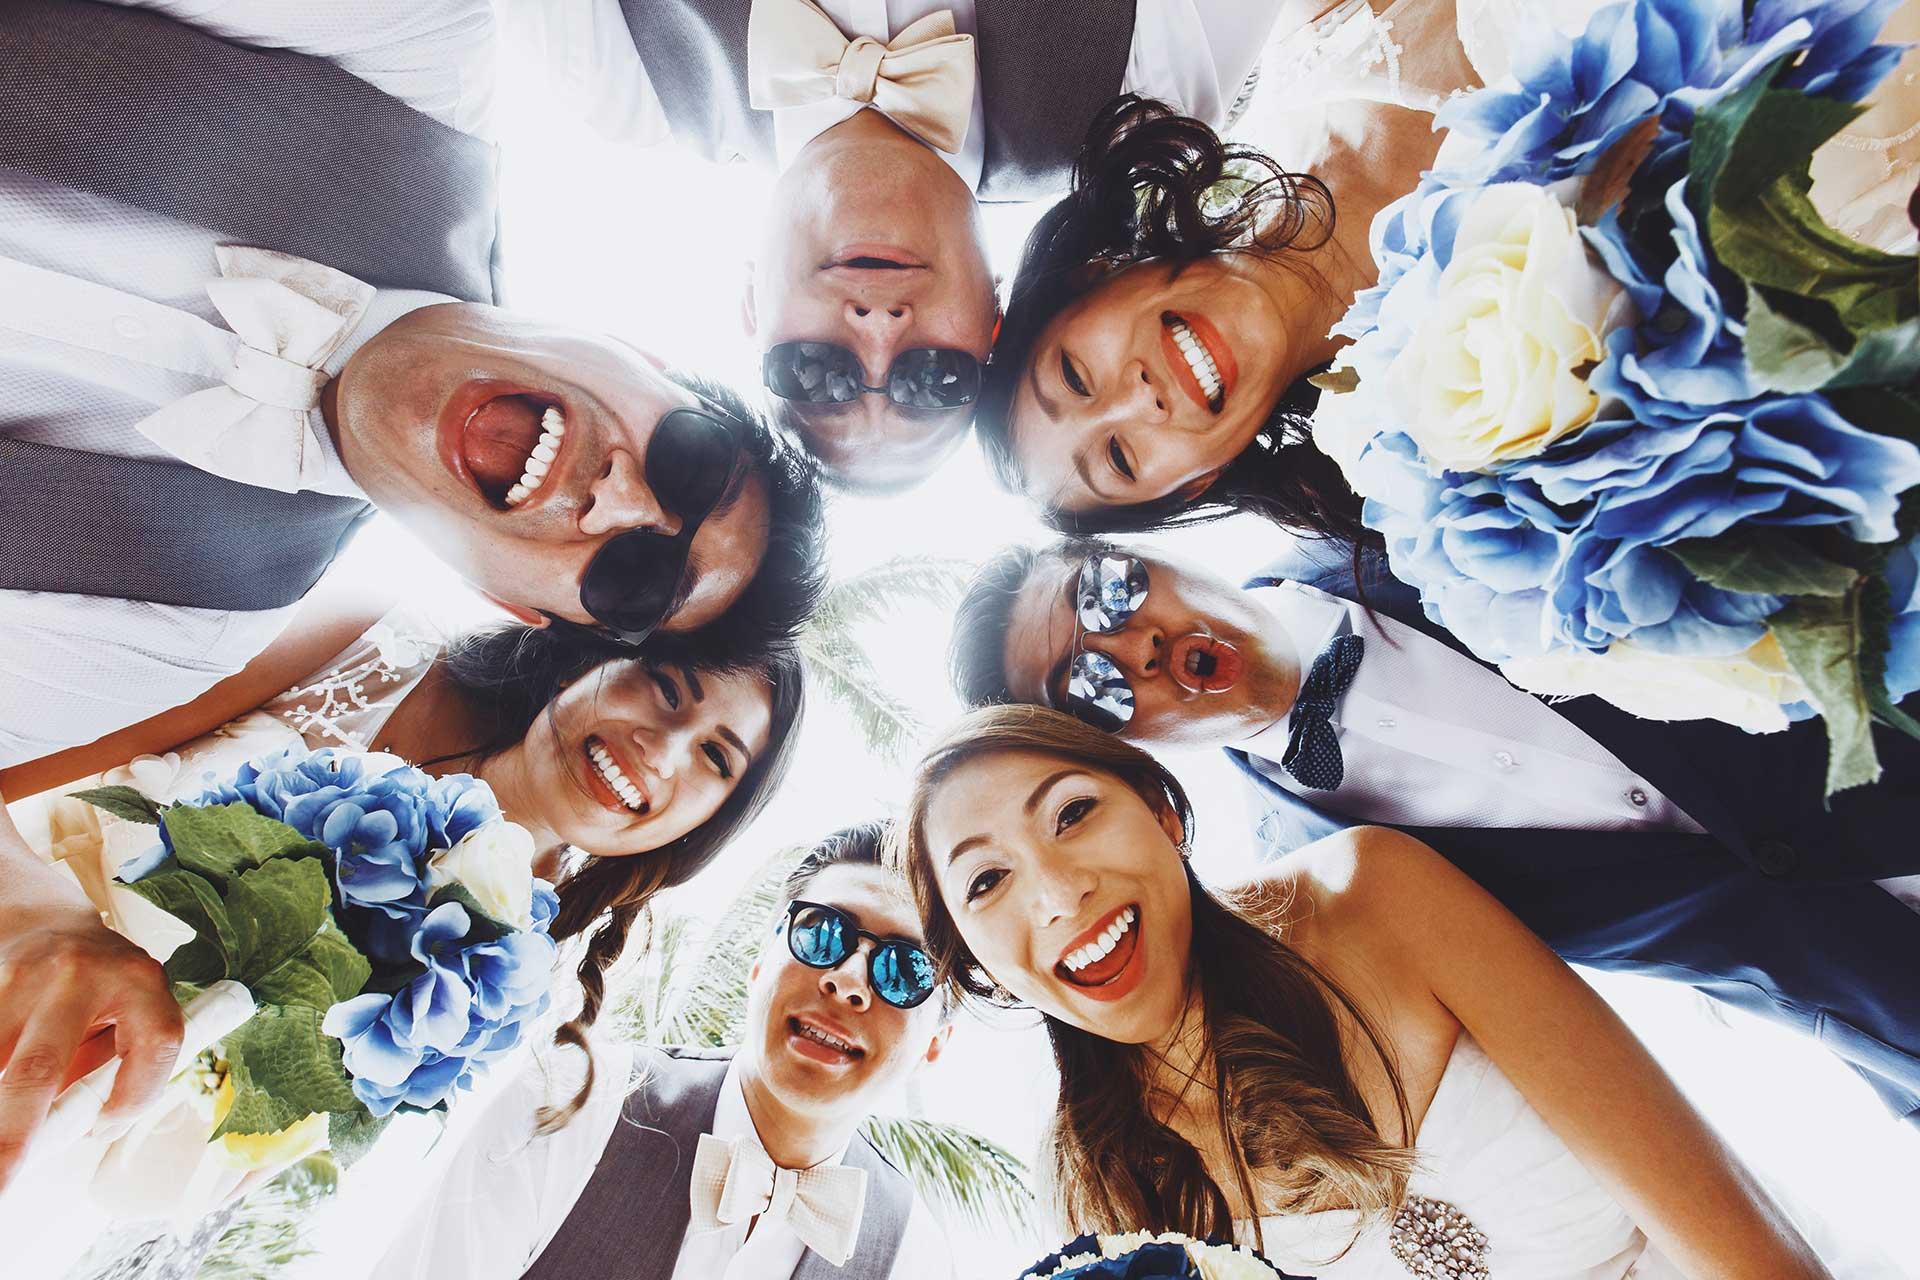 Brides men and Groom Girls - Five Top Trends for 2019 Brides